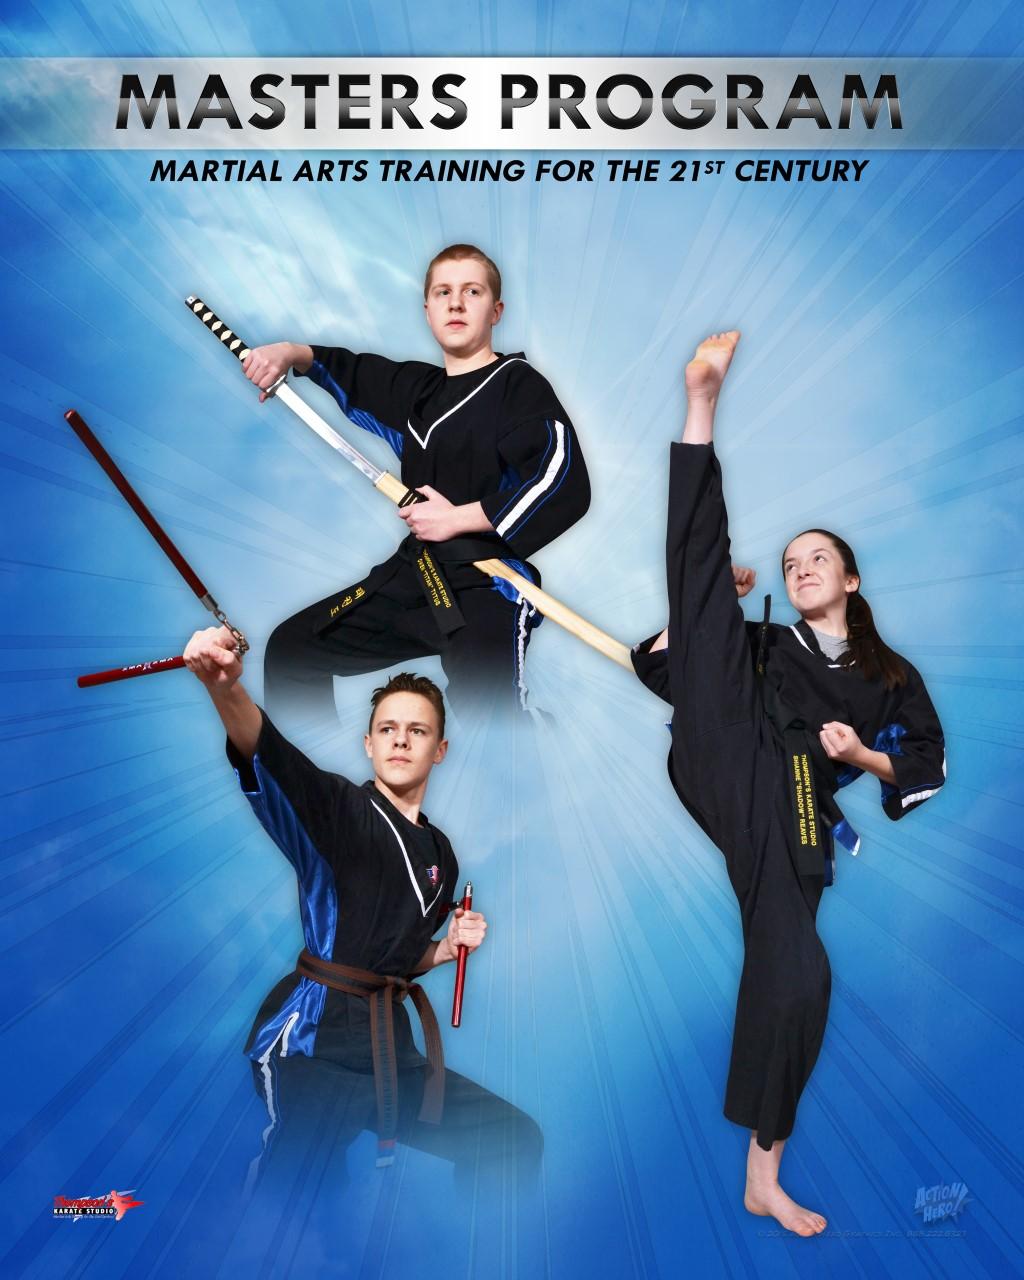 Masters Program | Thompson's Karate Studio, Greencastle PA